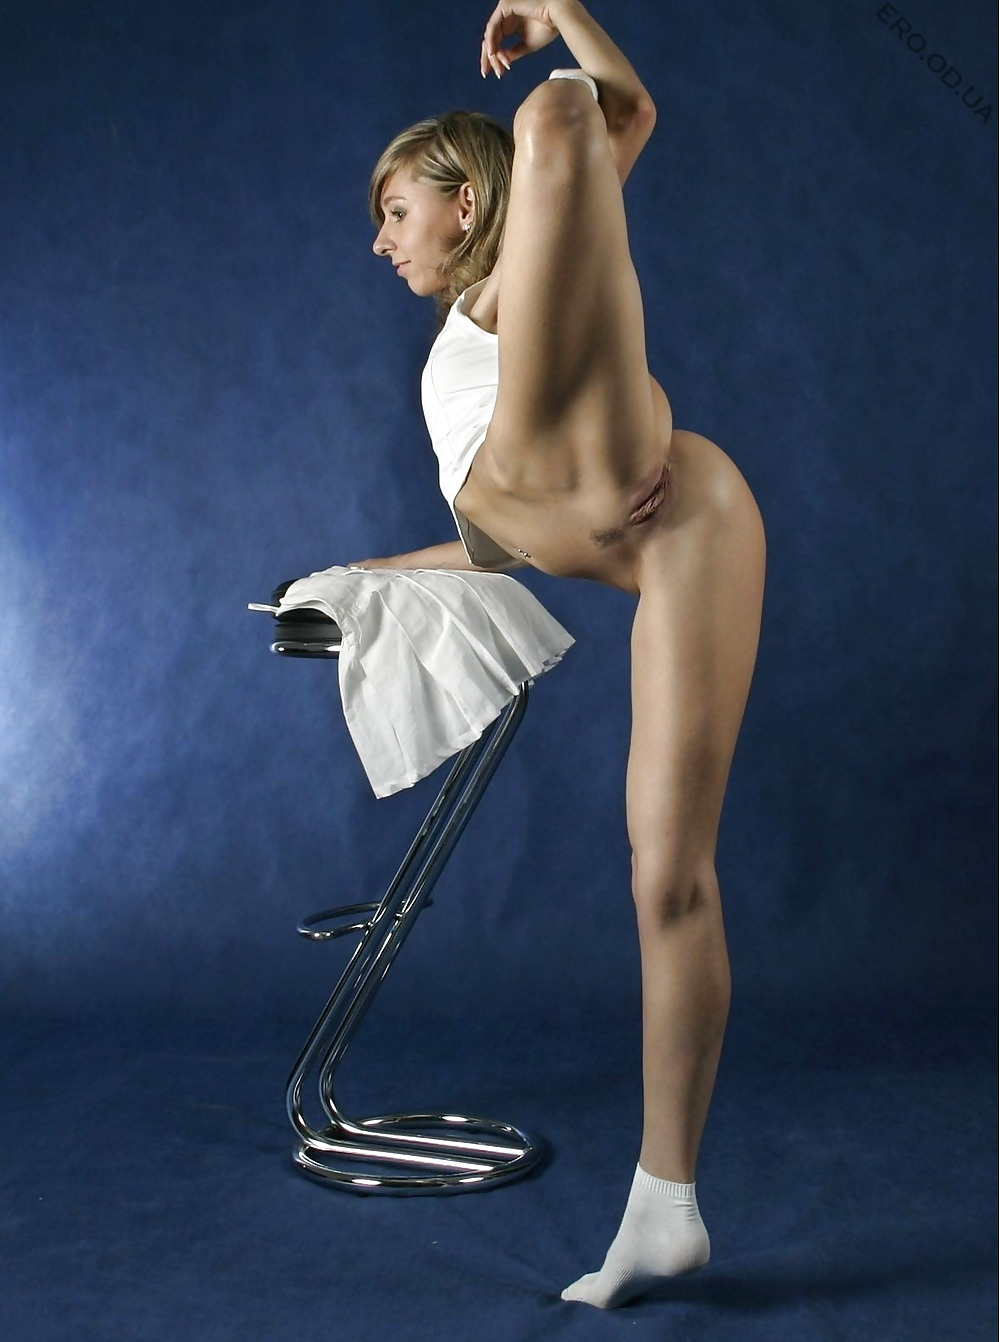 Margo naked gymnast, naked hippy models